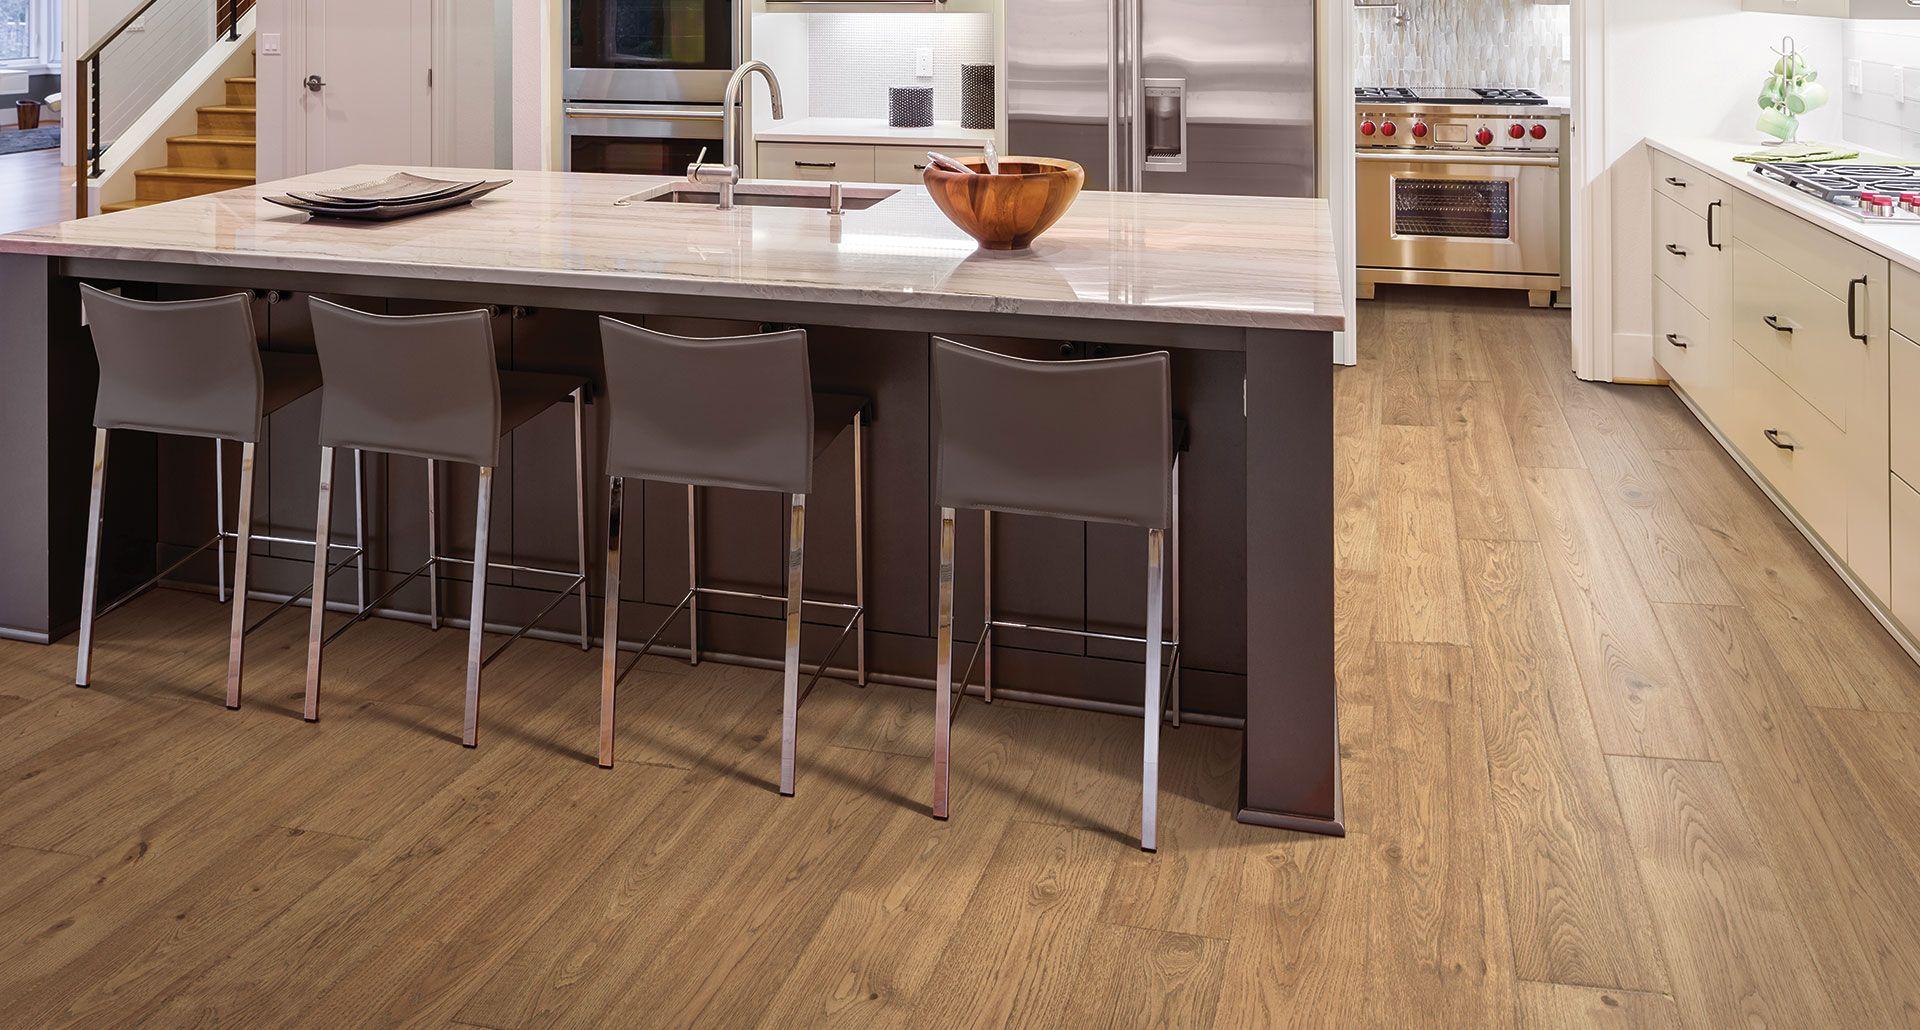 Brier Creek Oak Laminate Floor Natural Wood Look 12mm Thick 1